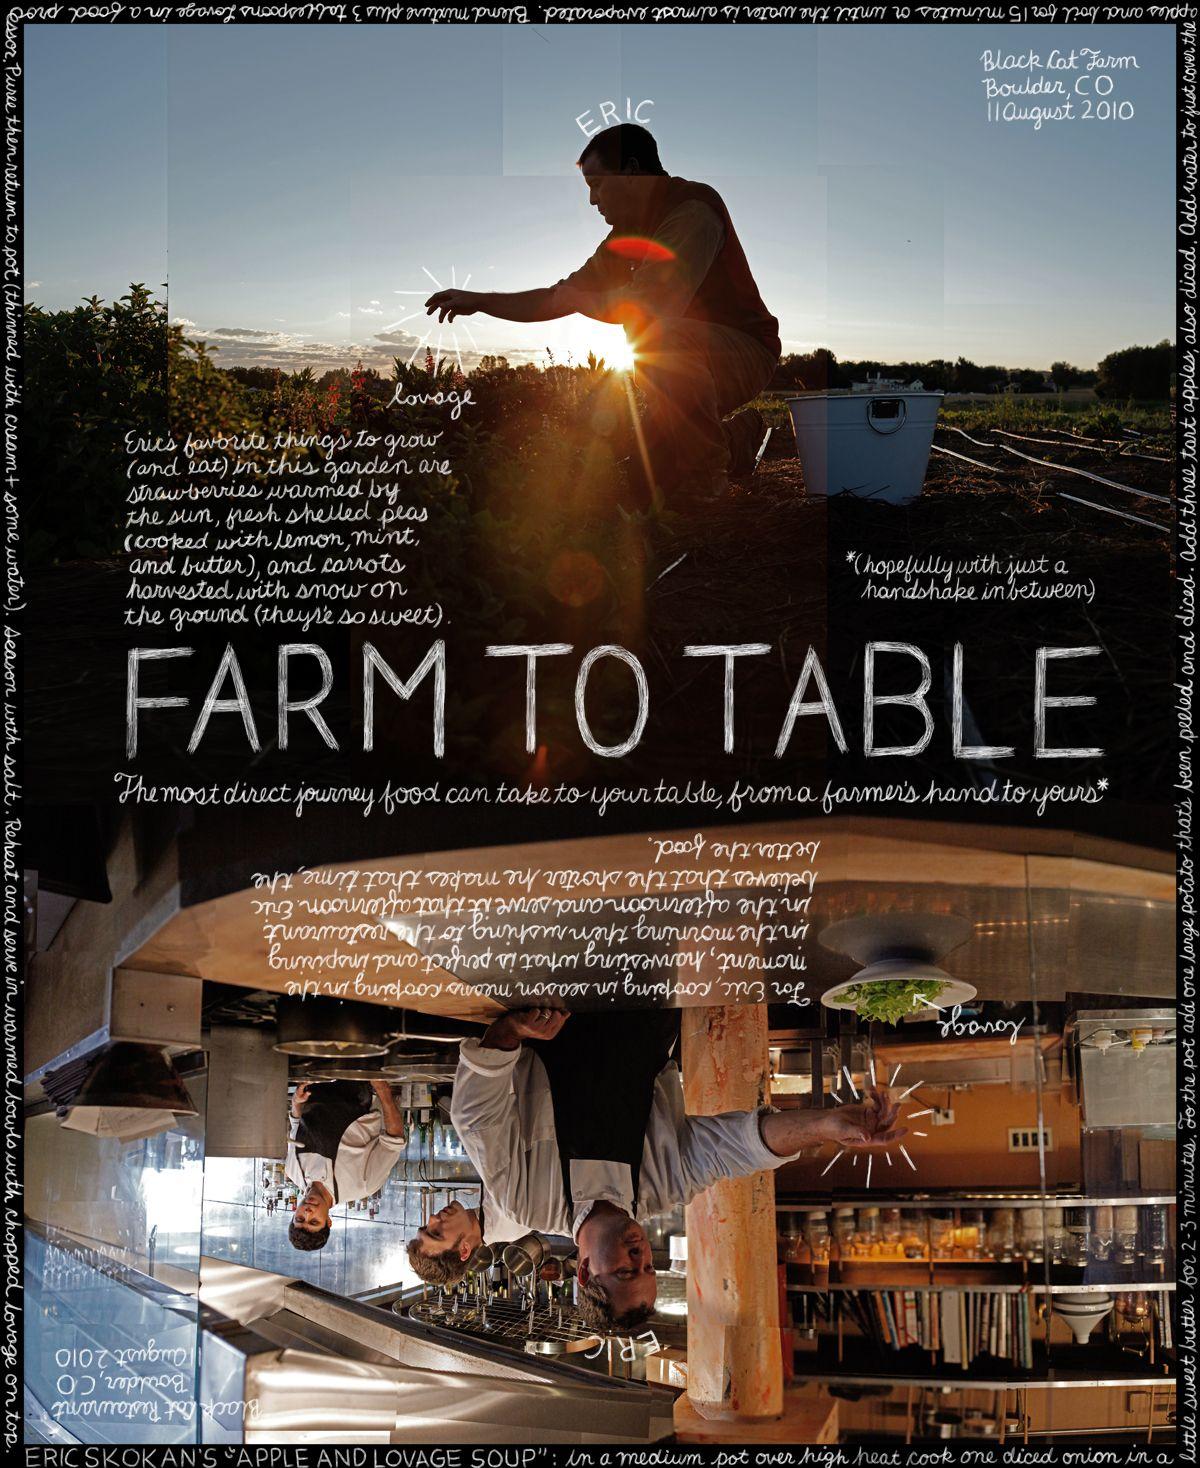 23 Farm To Table Eric Skokan Black Cat Farm Boulder